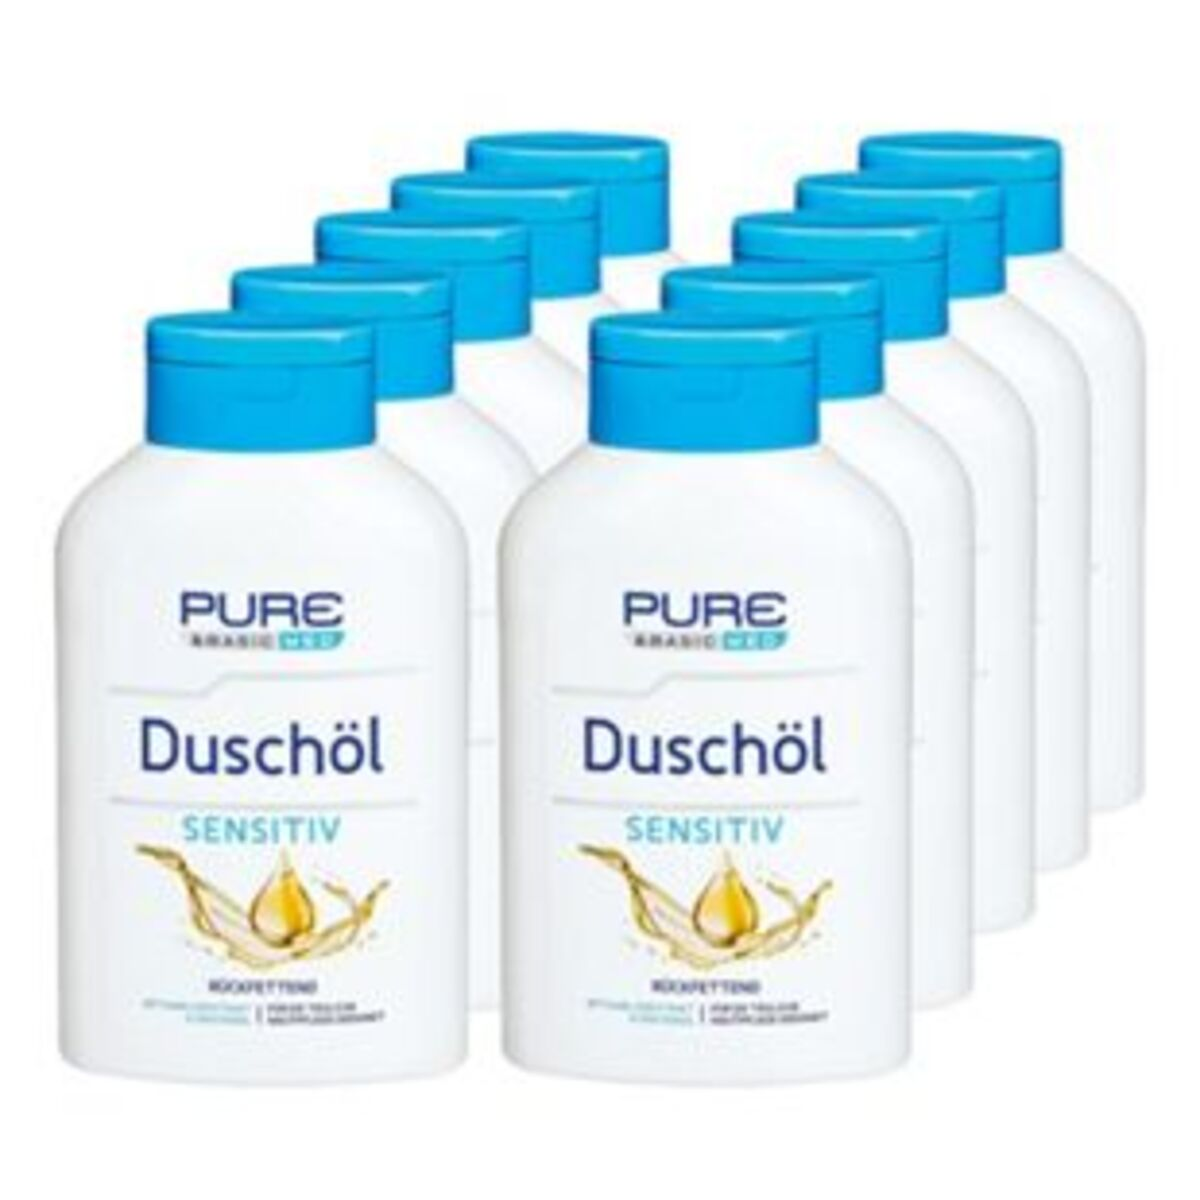 Bild 2 von Pure & Basic med Duschöl Sensitiv 300 ml, 10er Pack